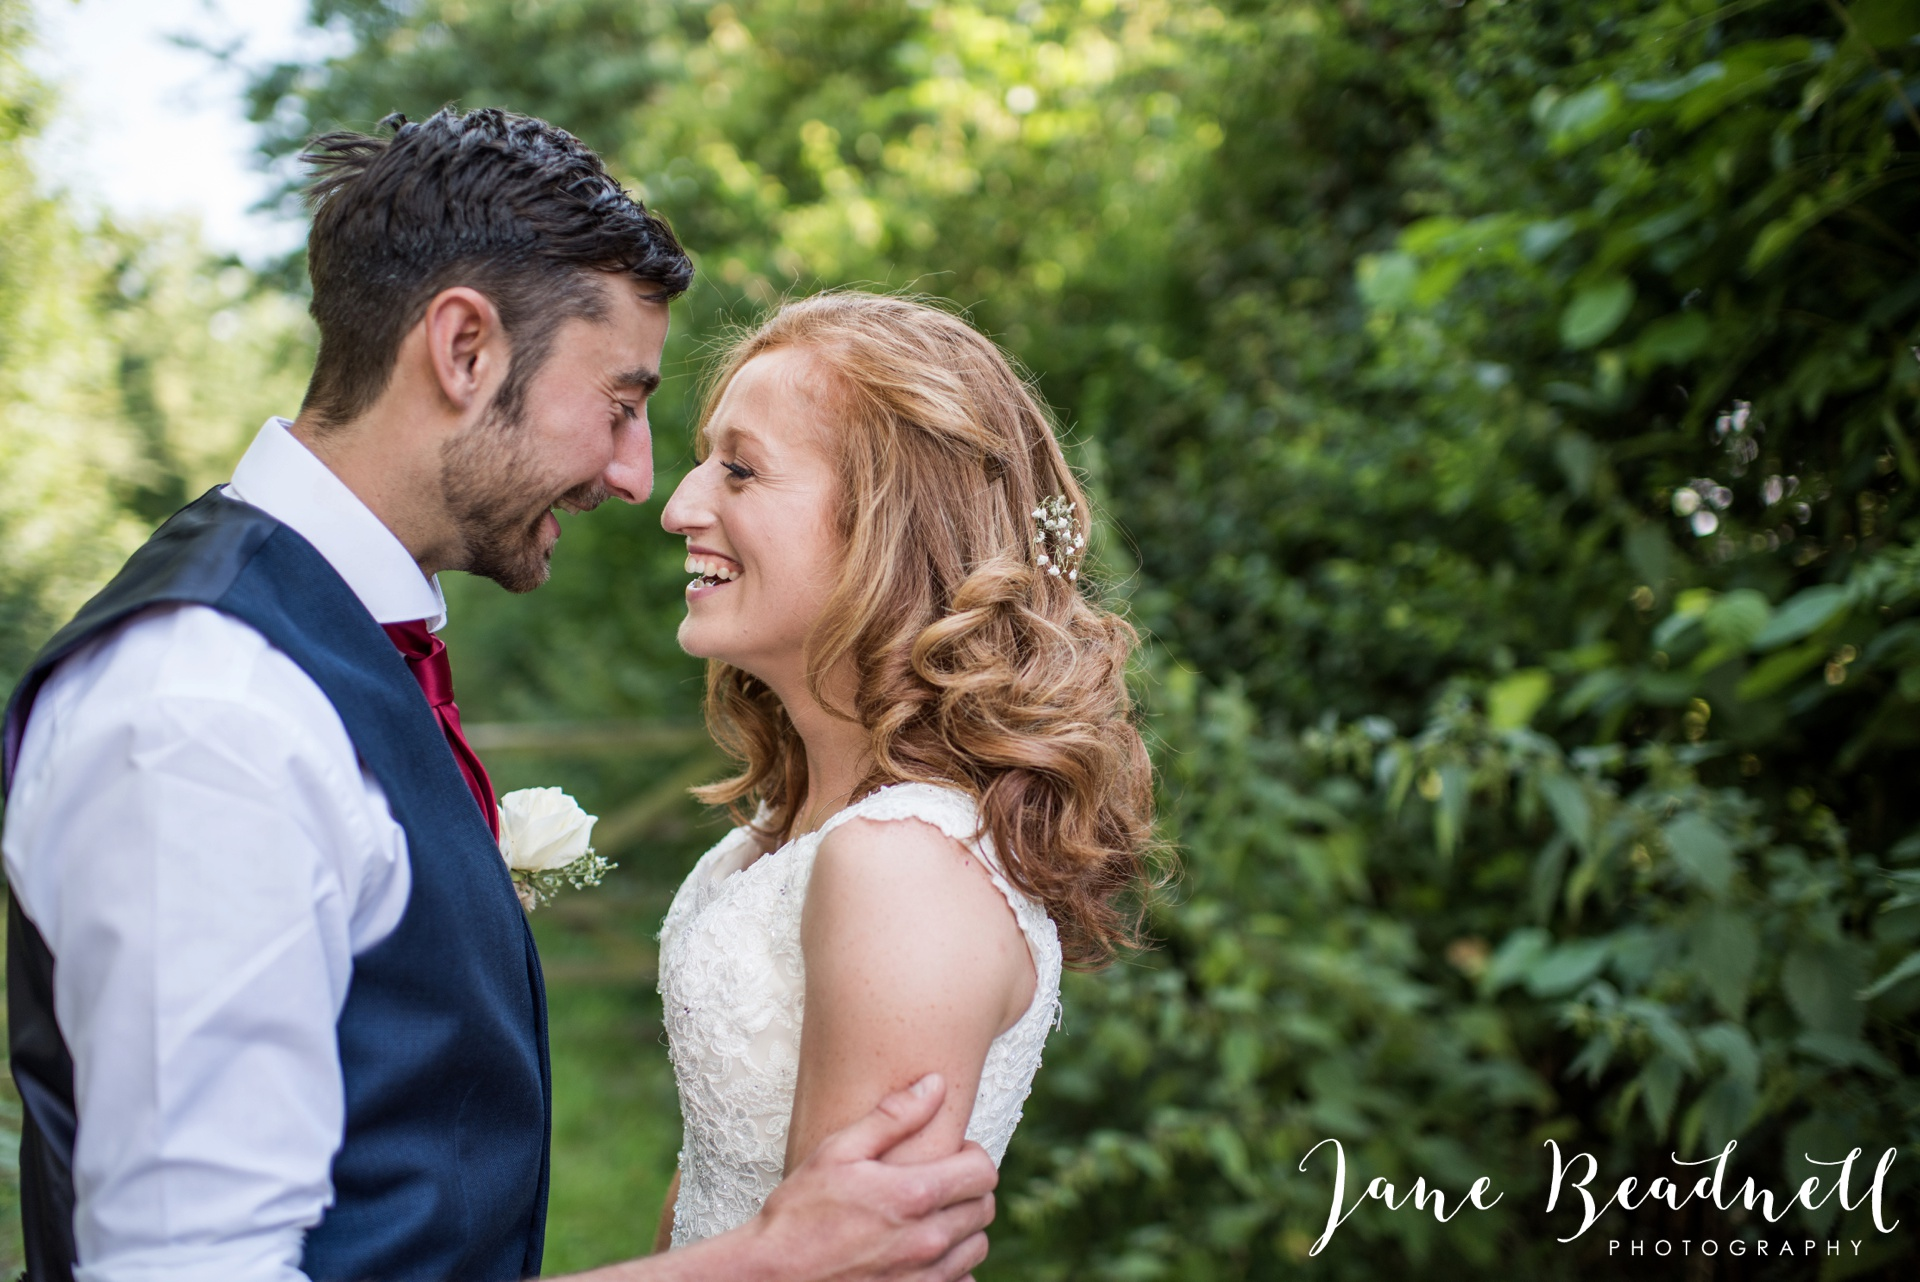 yorkshire-fine-art-wedding-photographer-jane-beadnell-photography-poppleton-york_0104